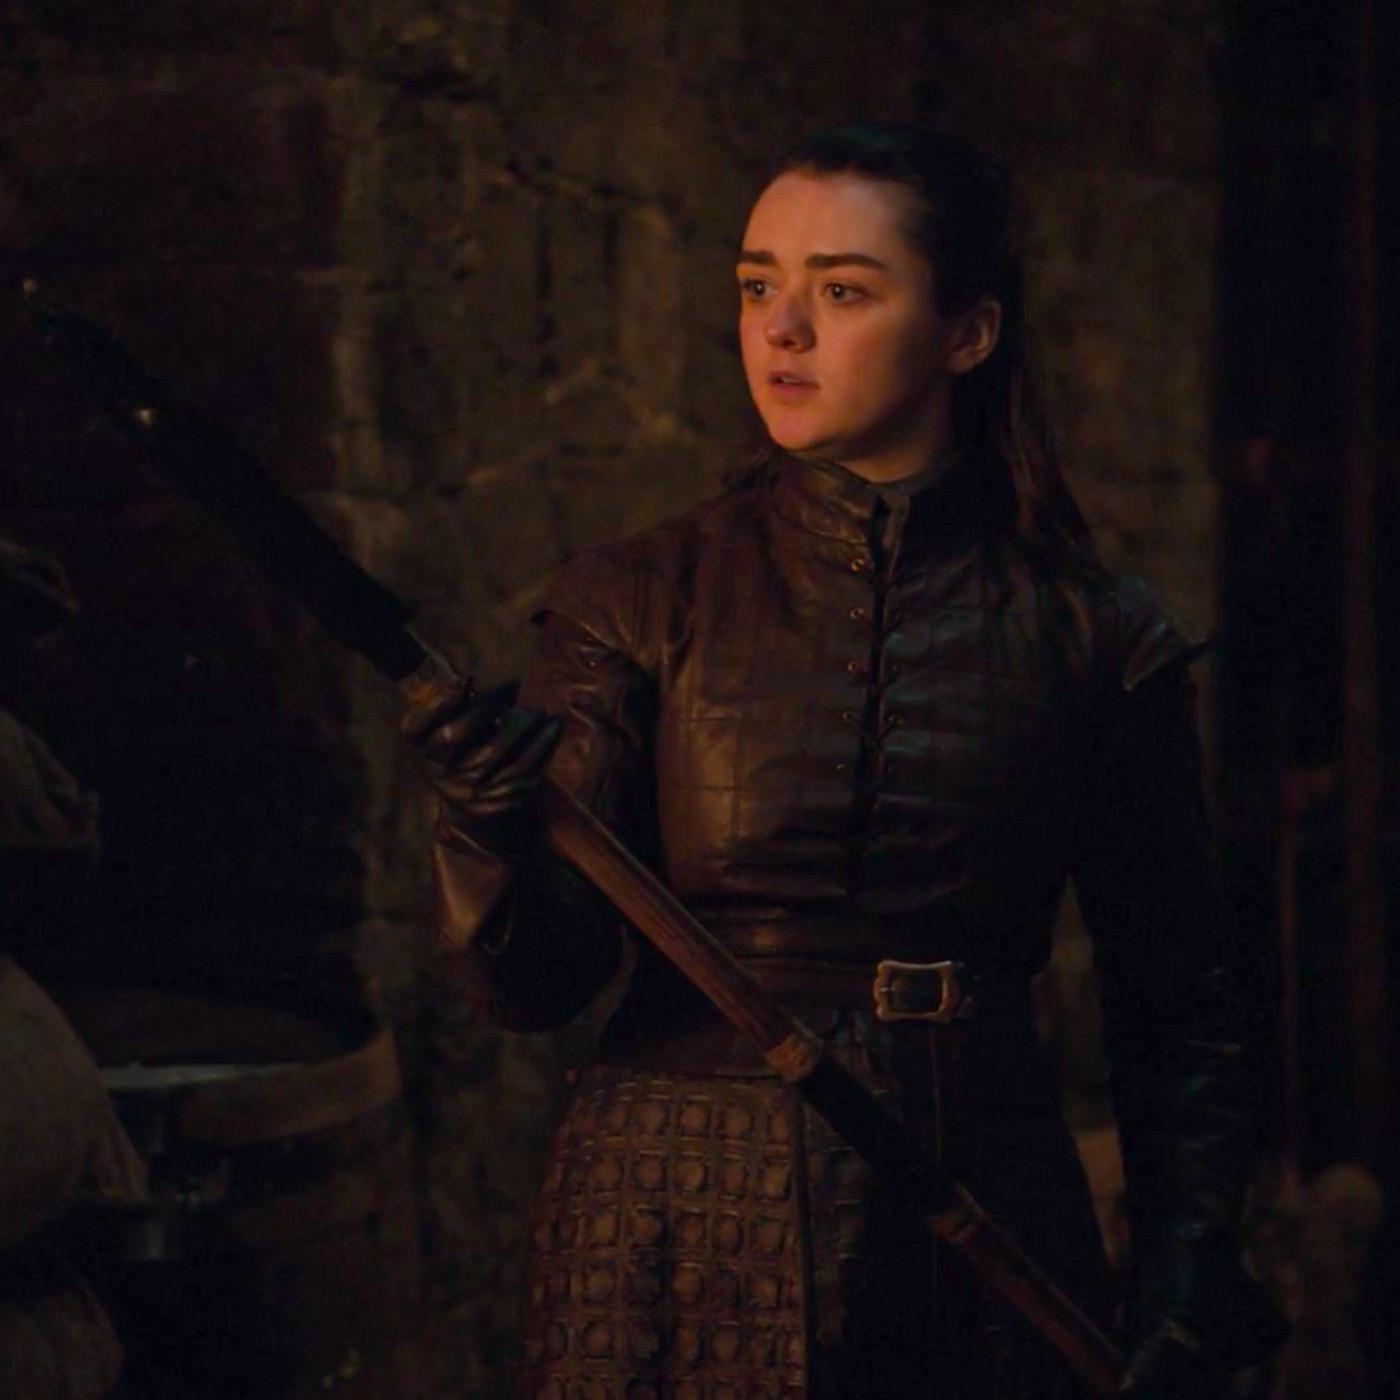 Game of Thrones season 8: Will Arya Stark kill the Night